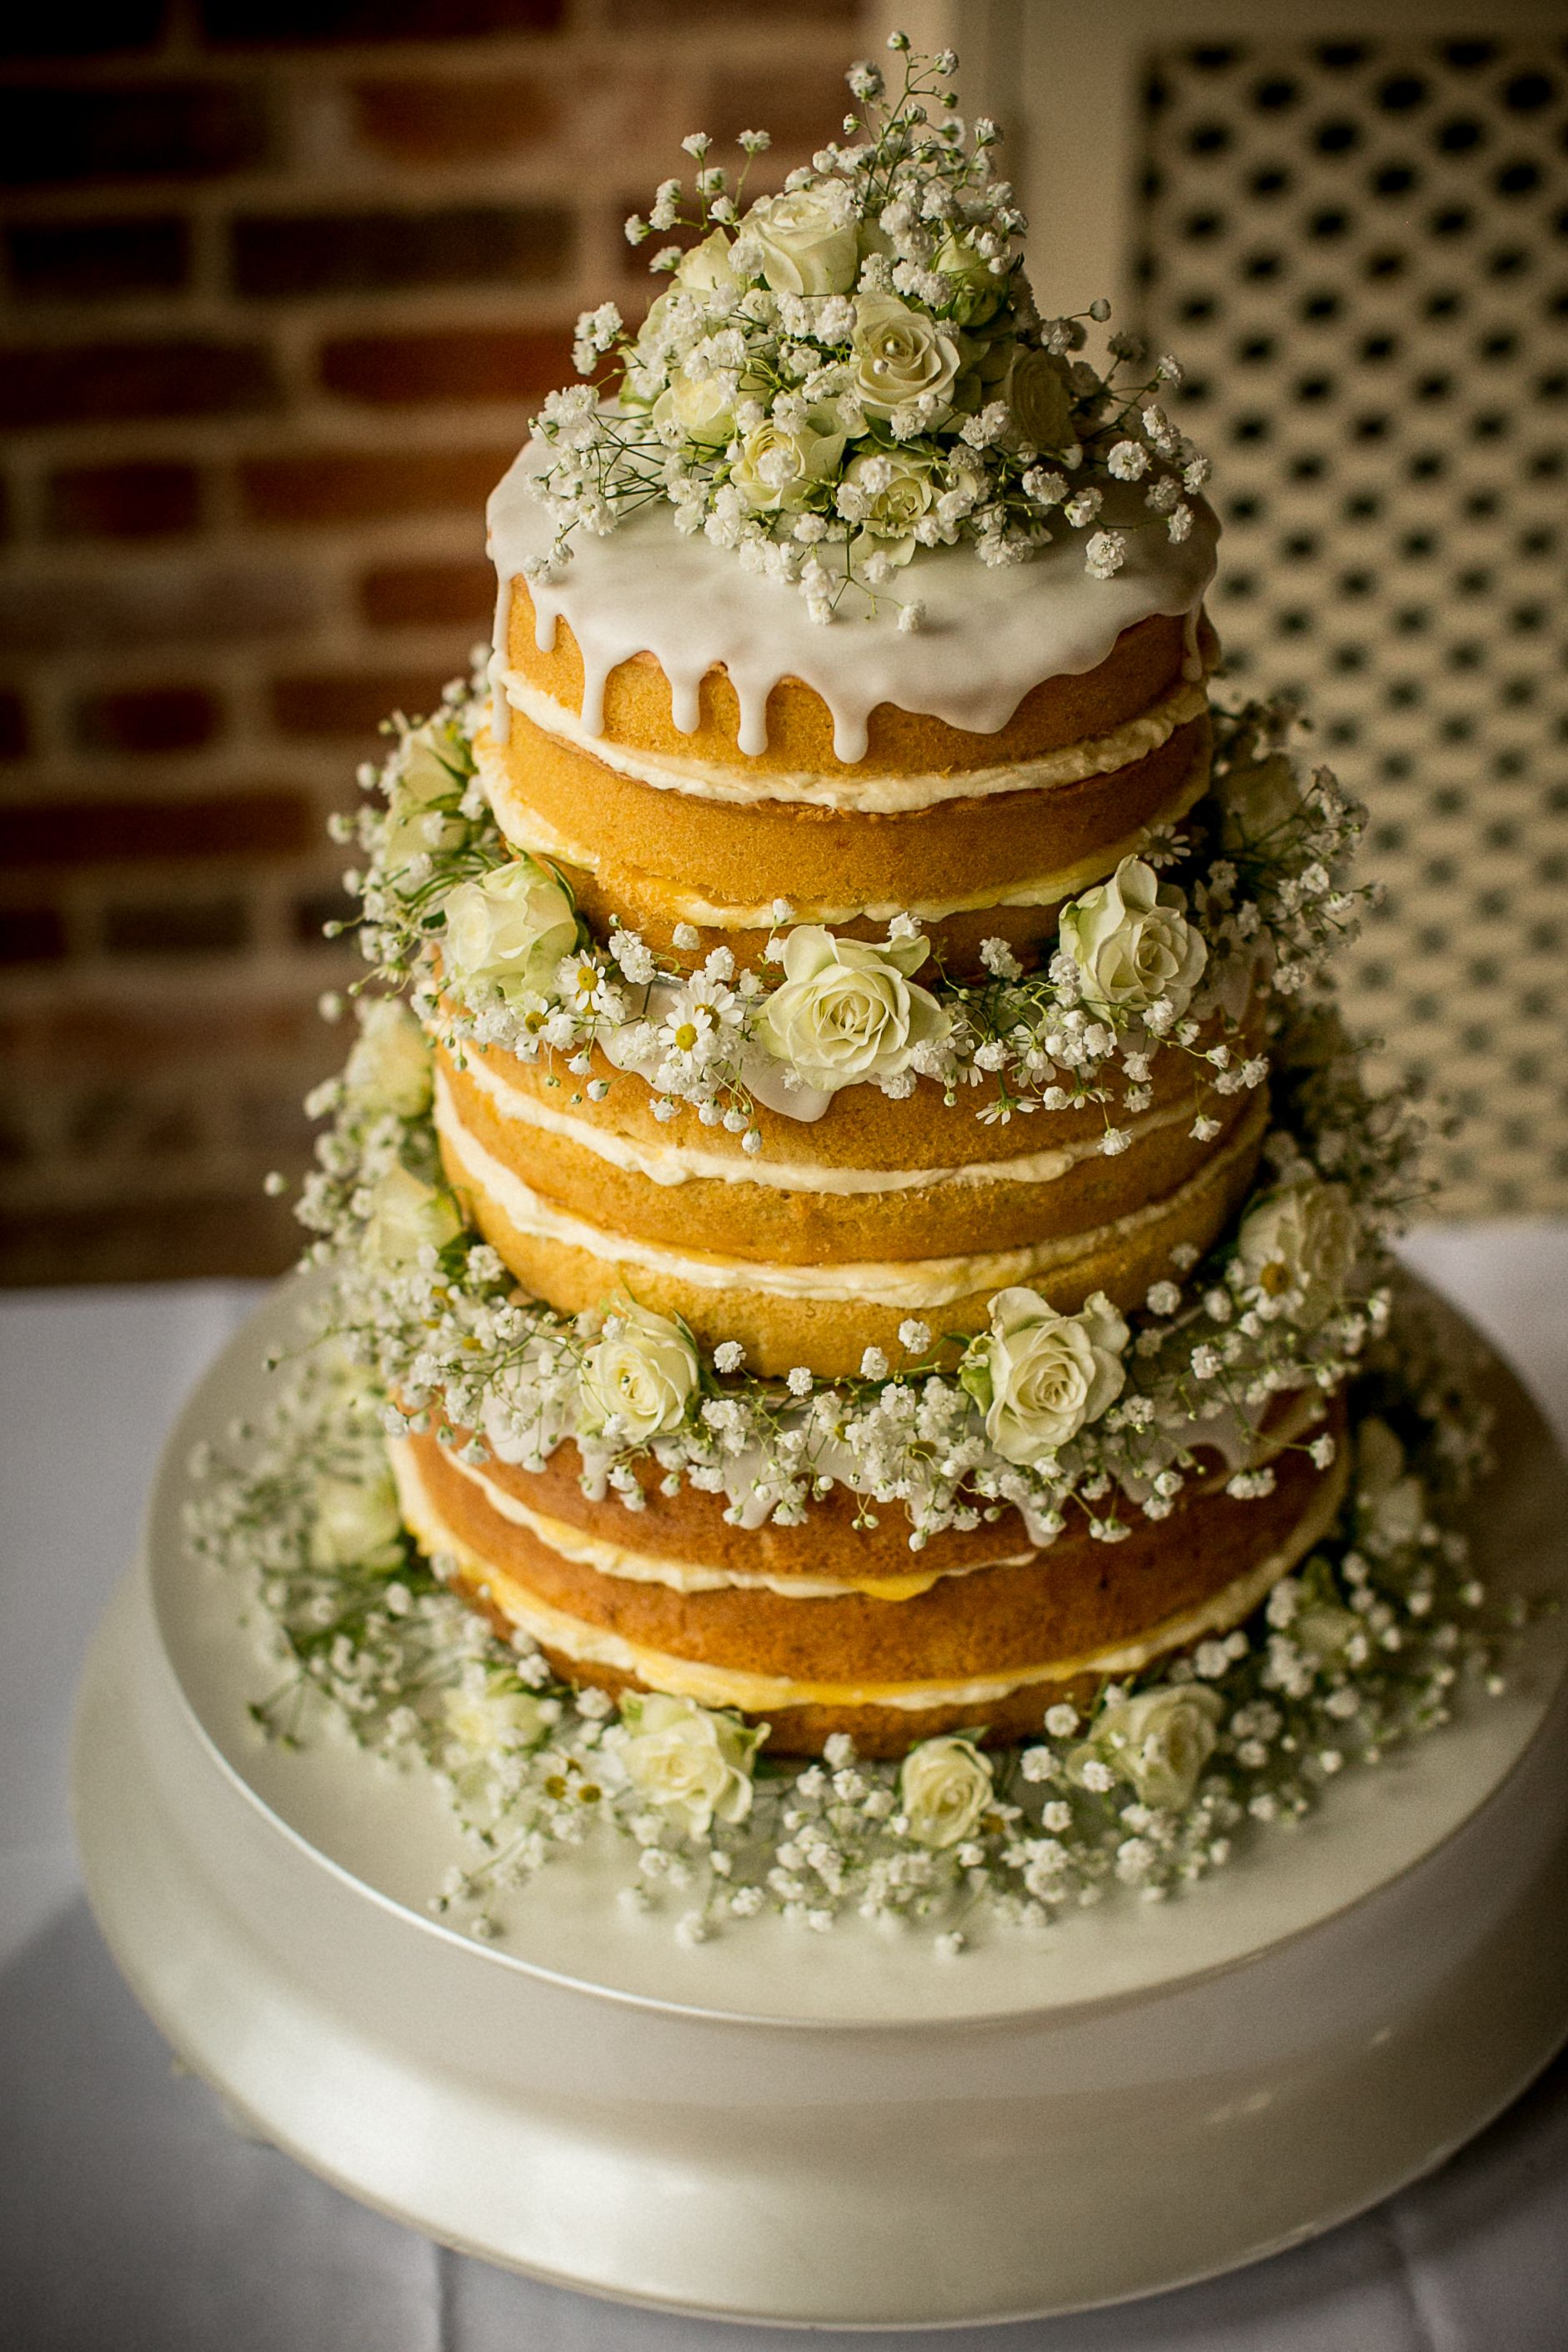 Pin by Ashley Hunlock on Cakes! Cakes! Cakes! | Pinterest | Lemon ...